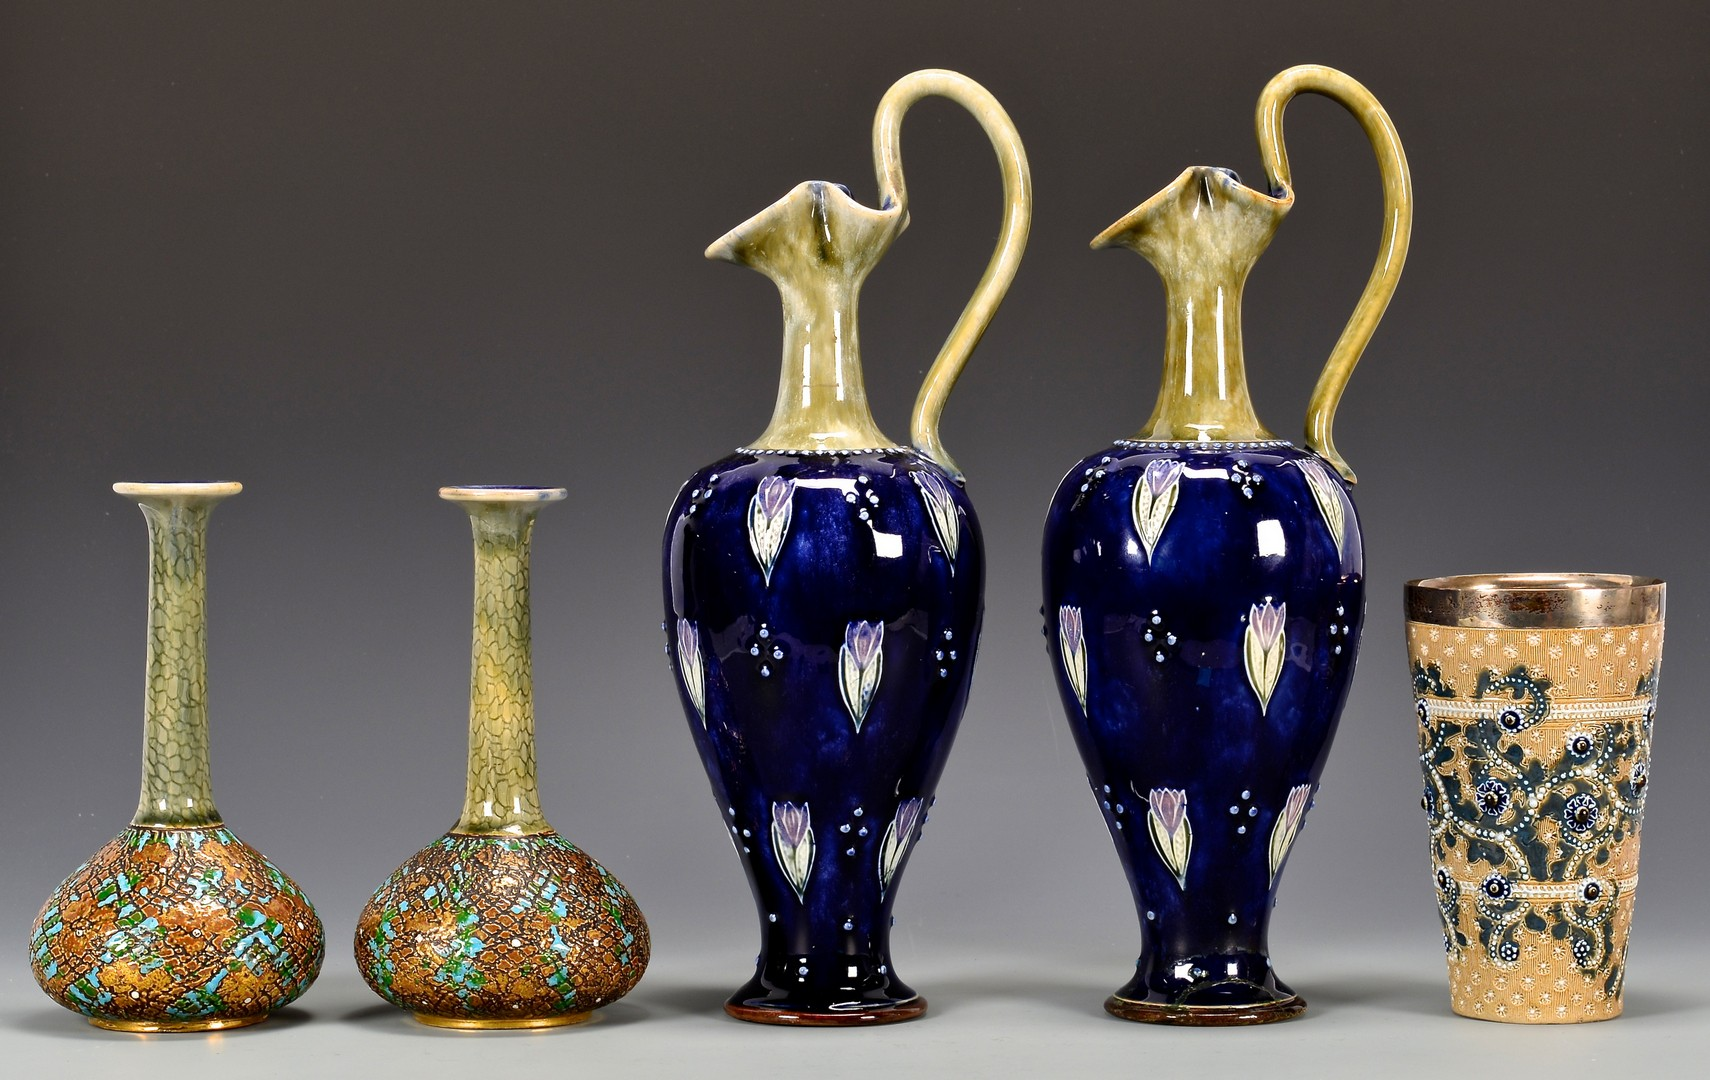 Lot 743: Group Doulton Pottery Items, 5 pcs.